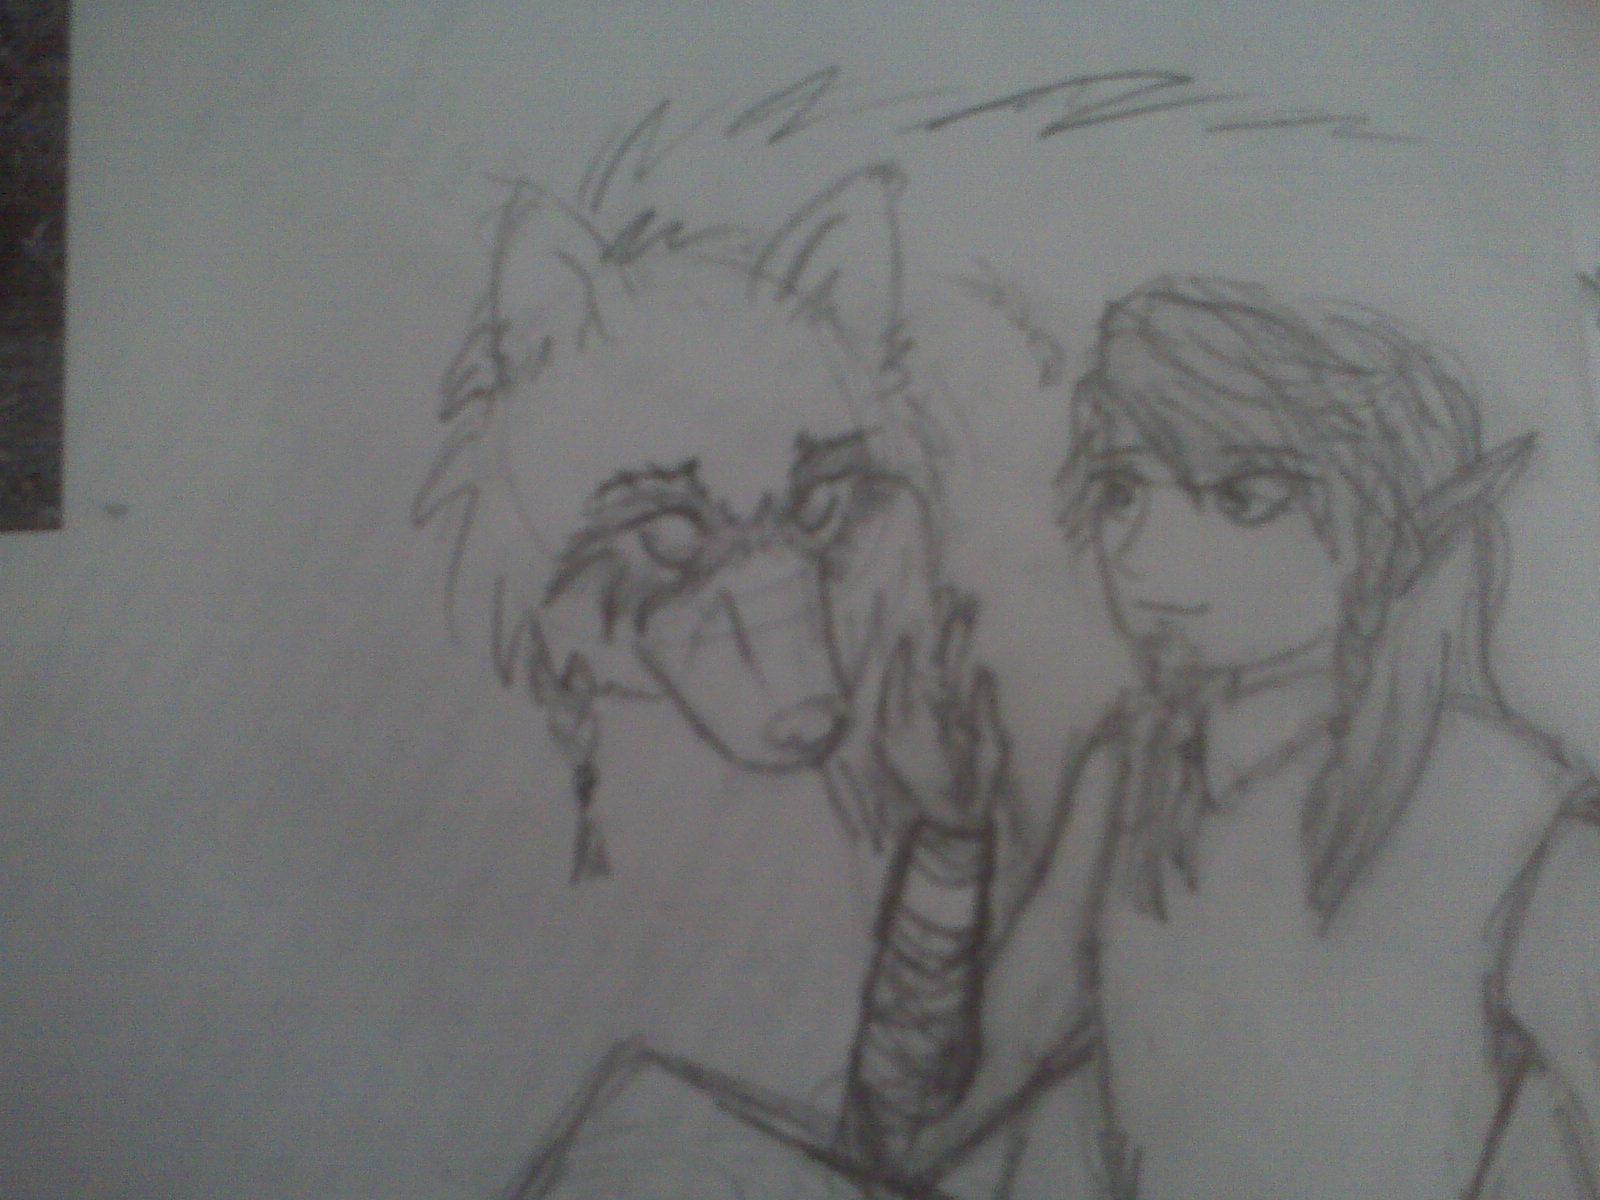 Sheyan and KD